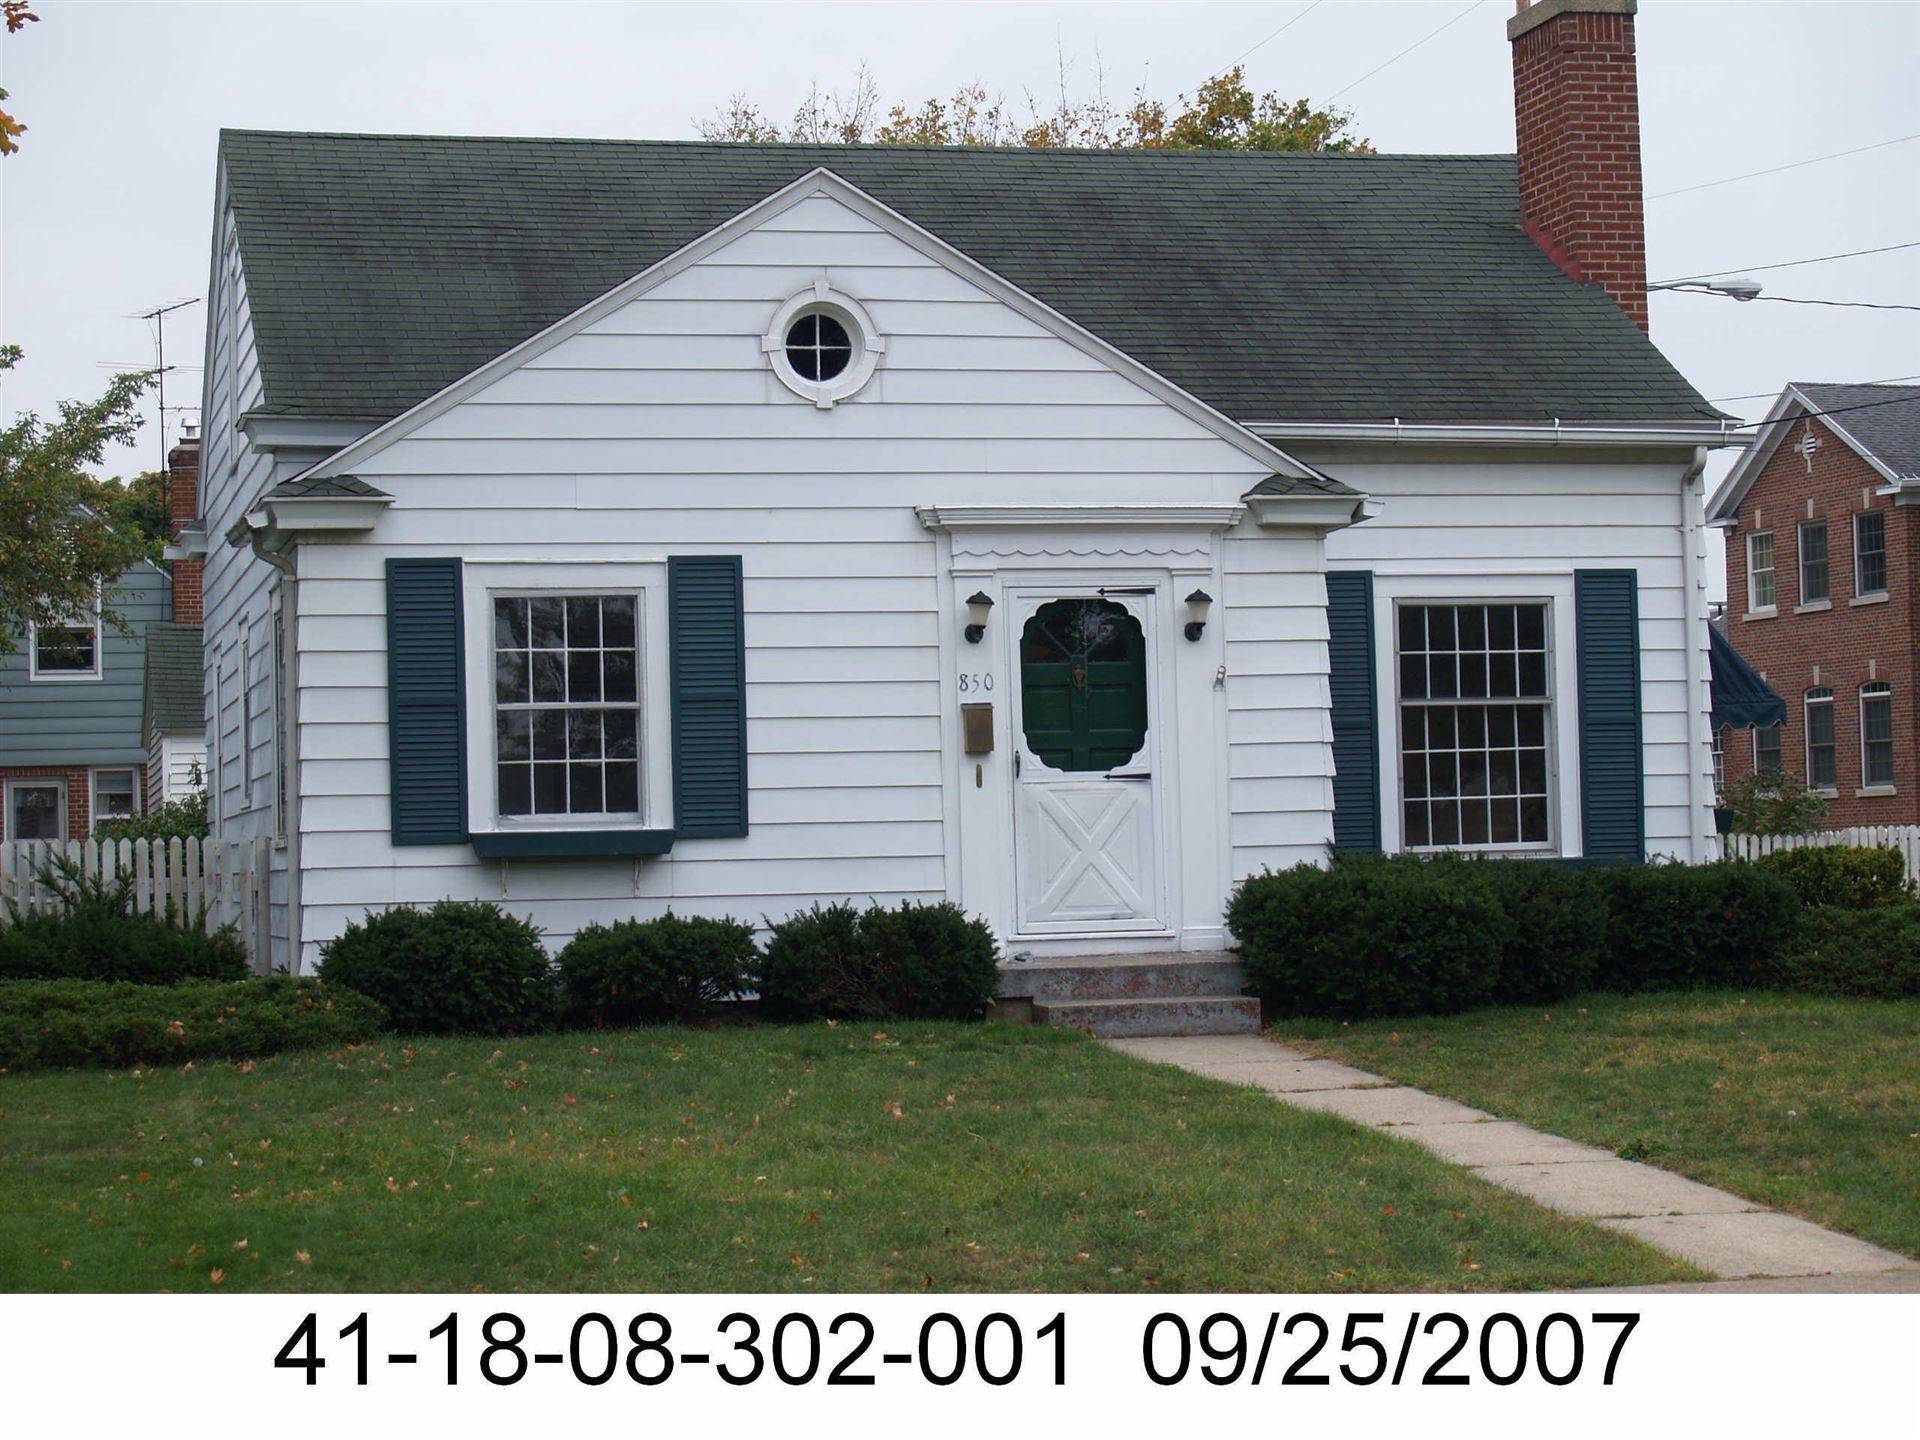 850 Alger Street SE, Grand Rapids, MI 49507 - MLS#: 21016474